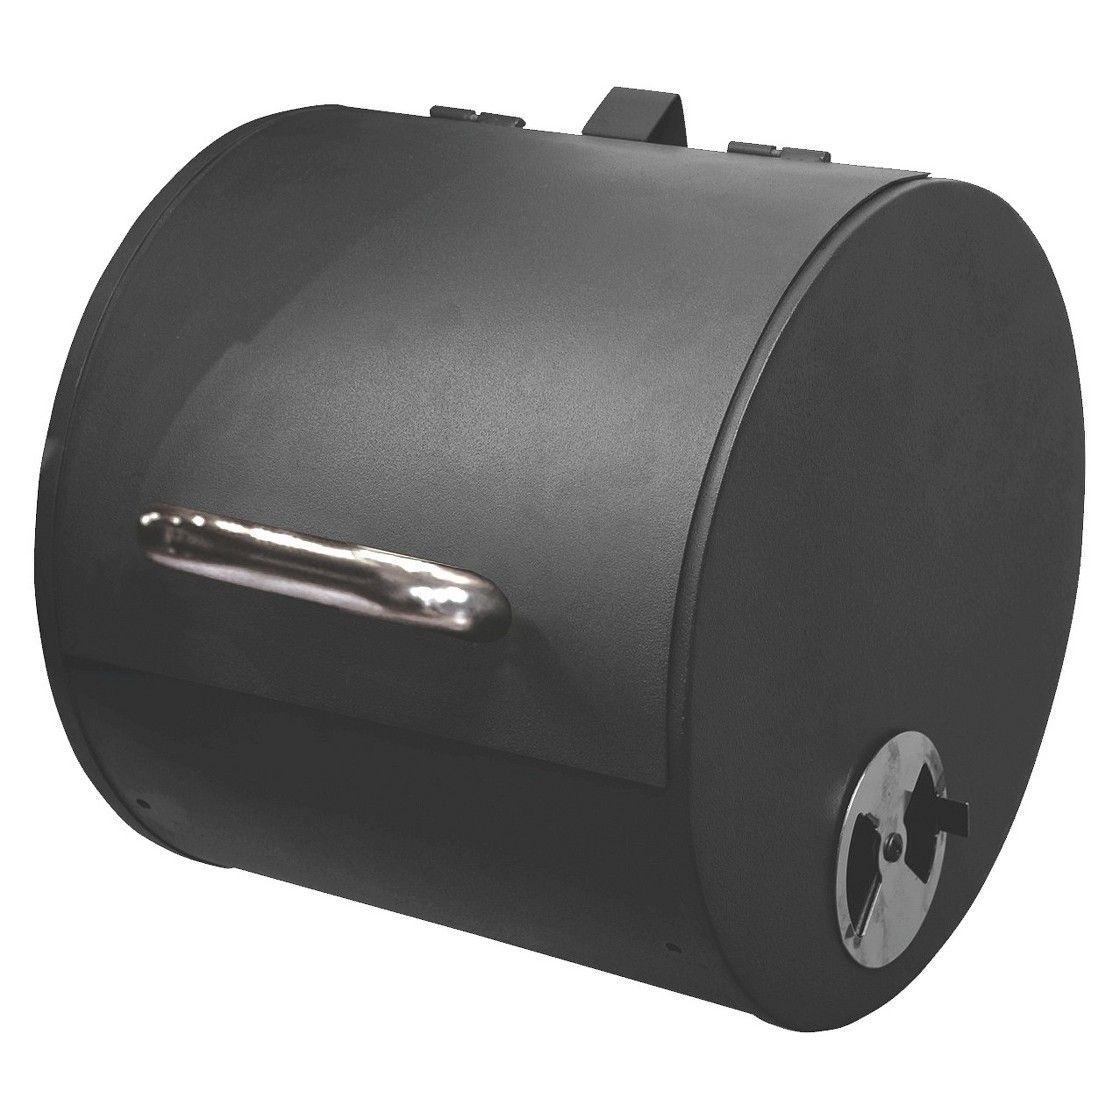 Charbroil side smoker box w chrome handle chrome